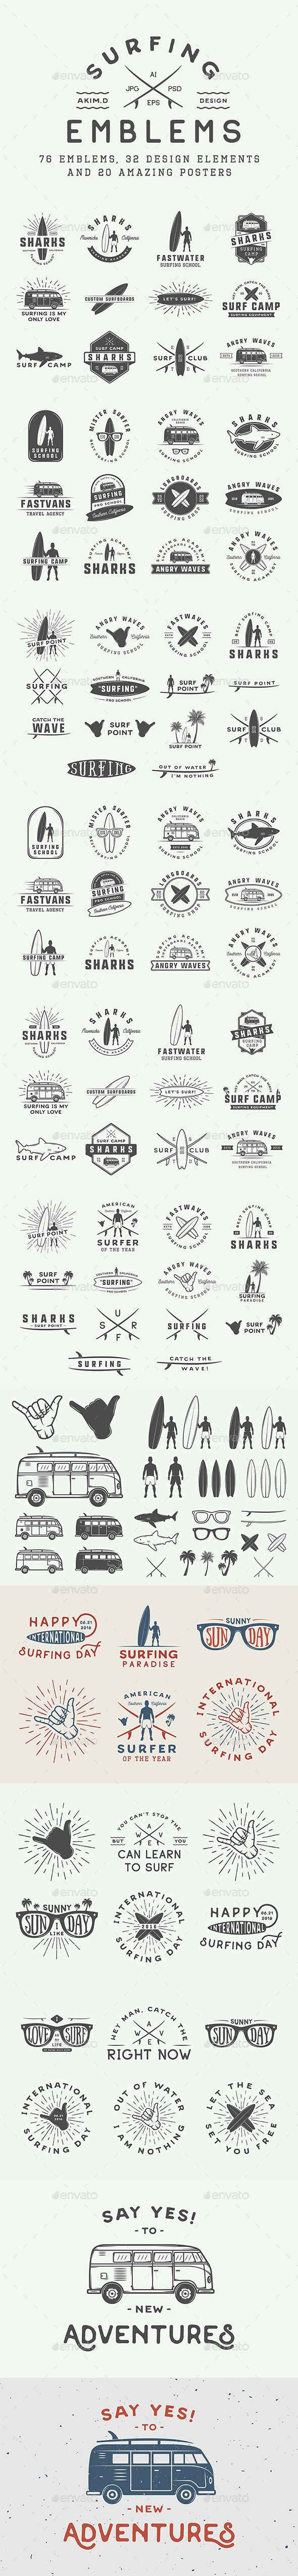 Vintage Surfing Emblems Templates PSD, Vector EPS, AI Illustrator